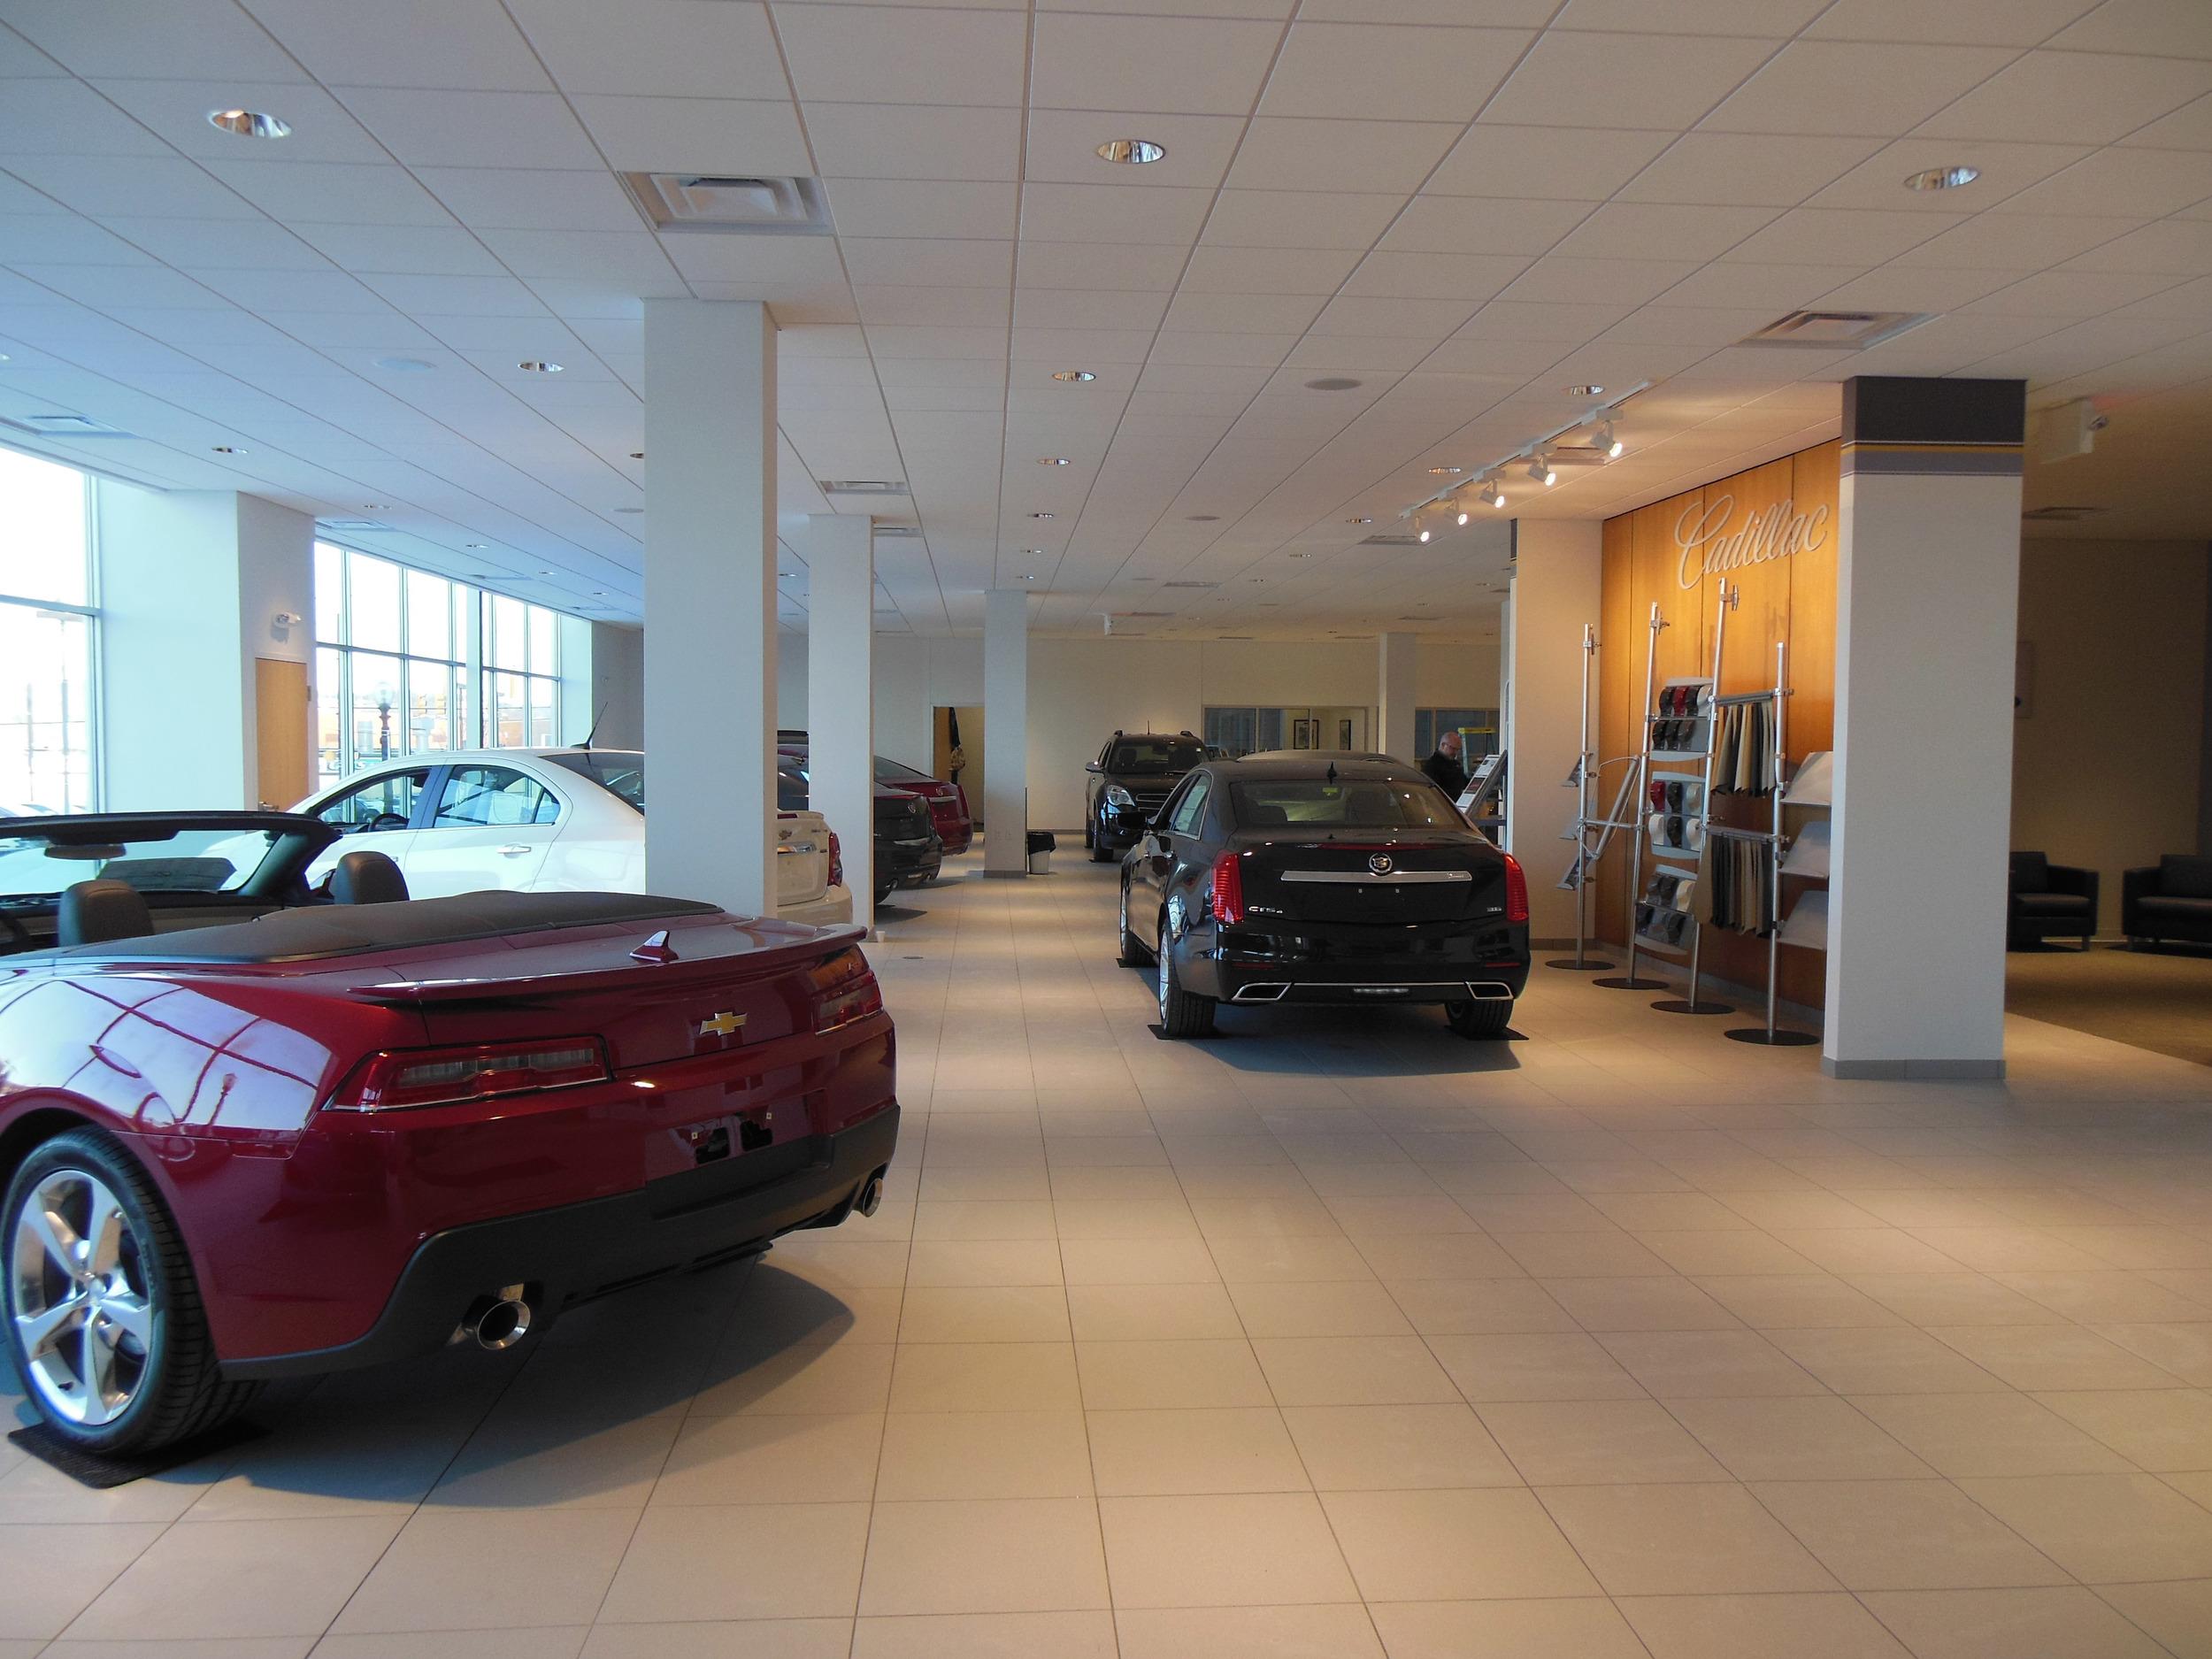 McElwain Chevrolet & Cadillac, Ellwood City, PA (interior)